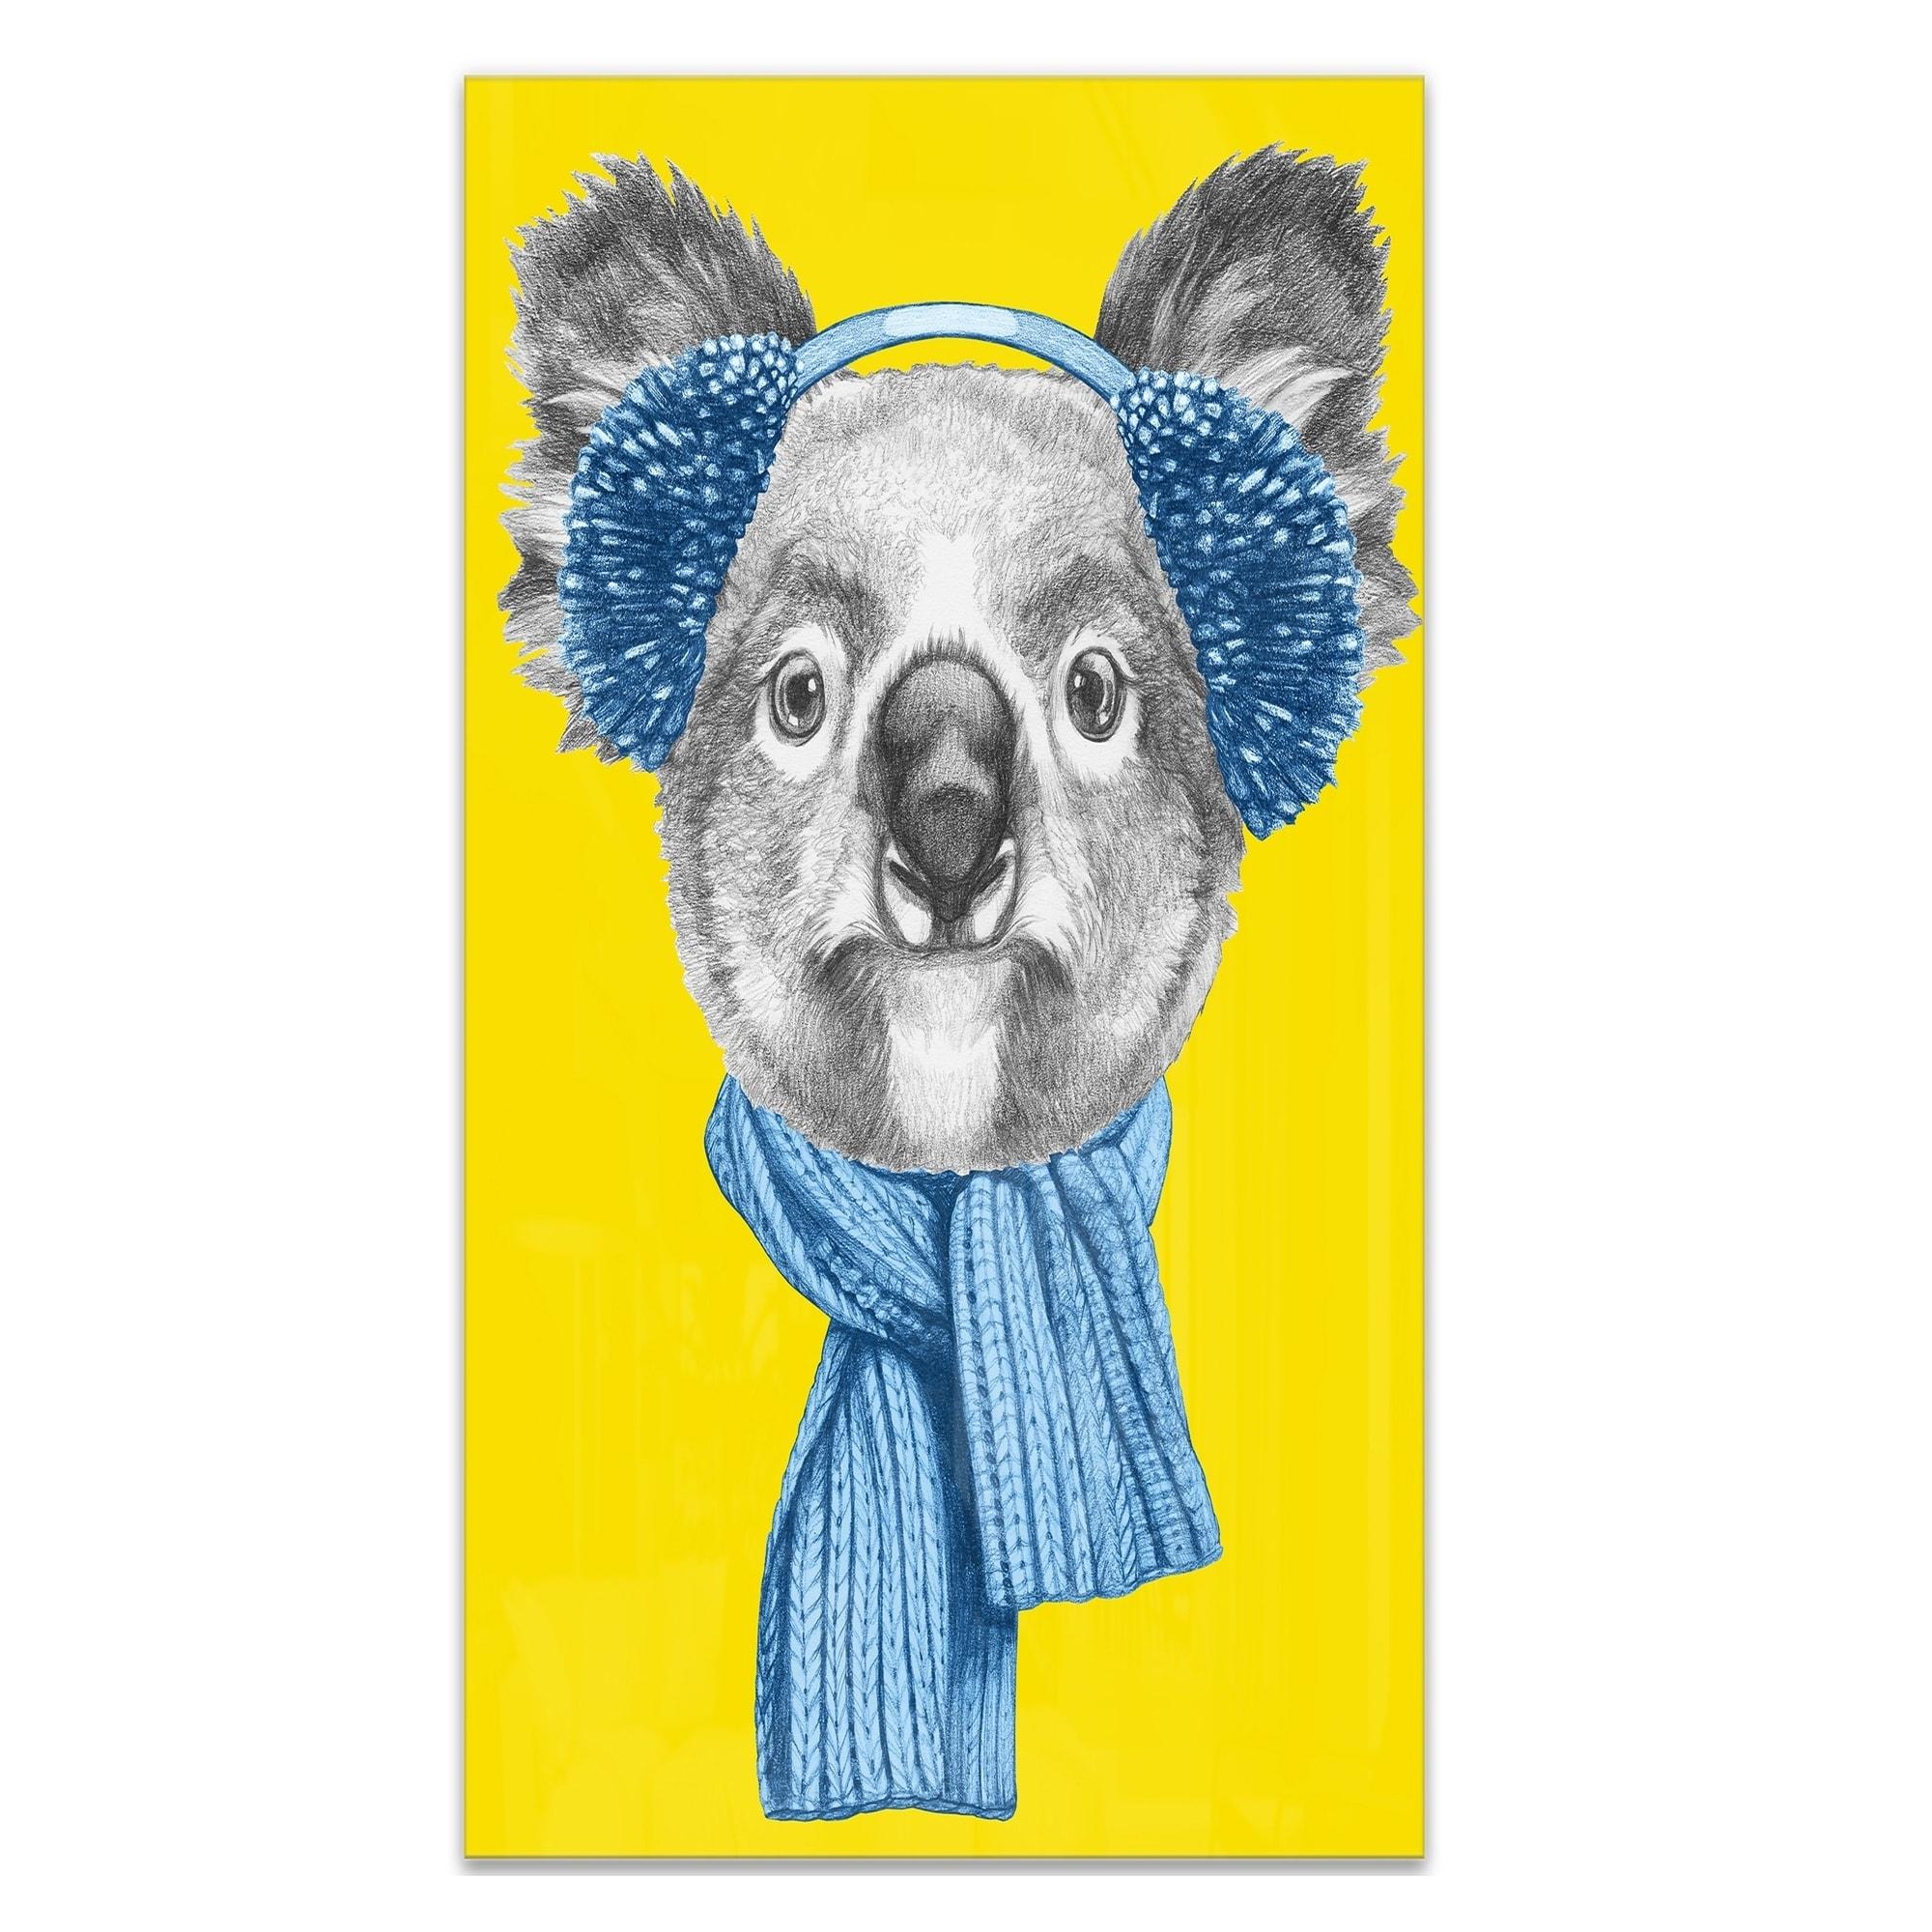 Details about Designart \'Koala with Scarf and Earmuffs\' Modern Animal Metal Wall Art